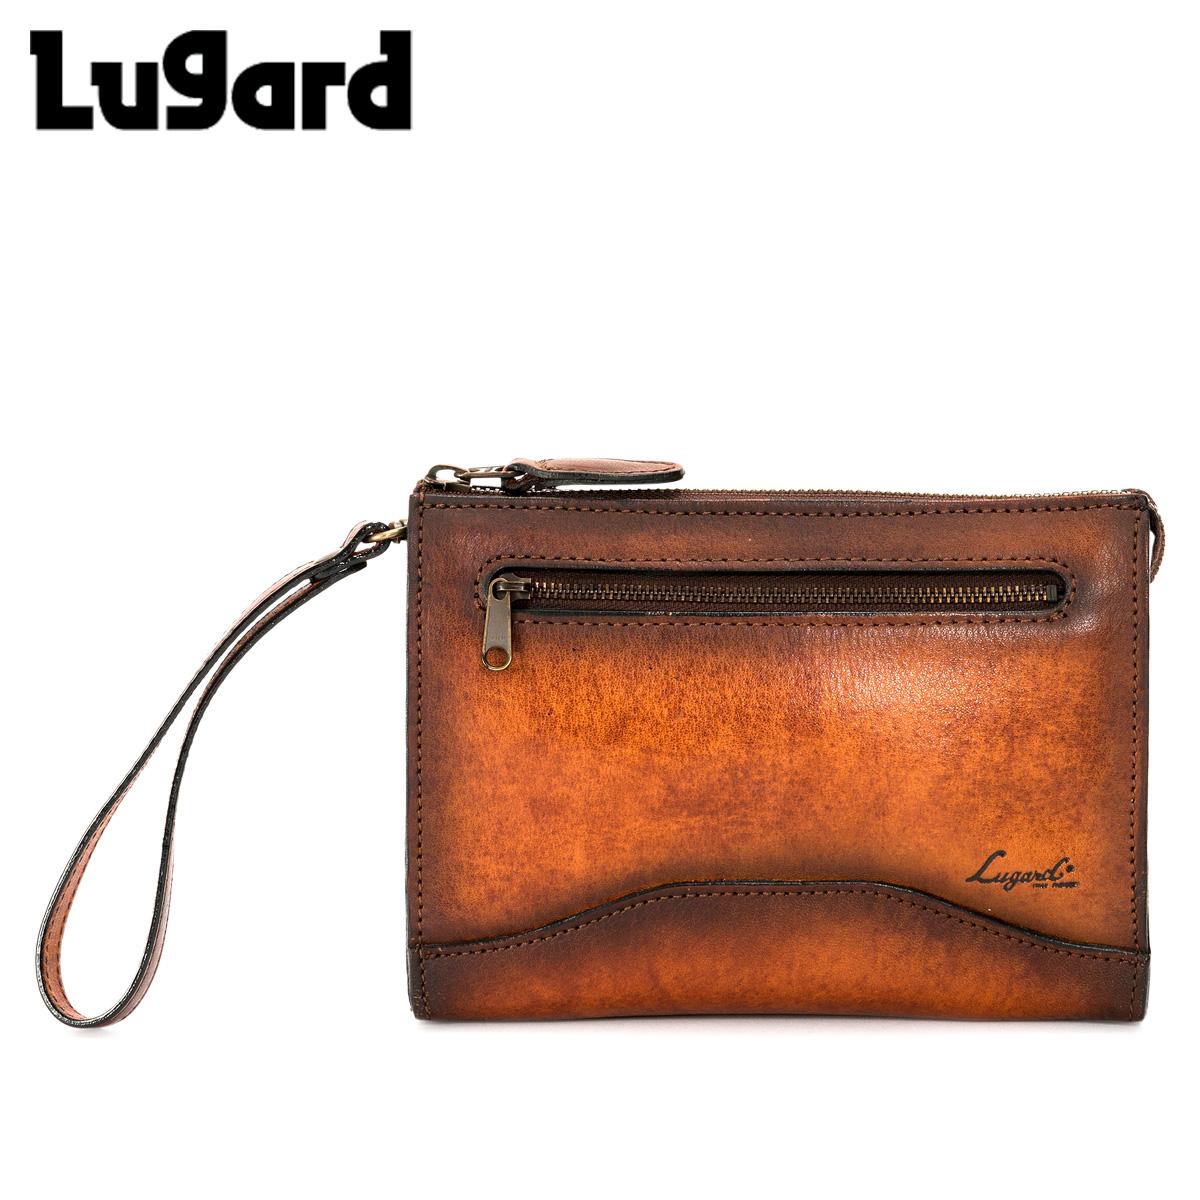 Lugard ラガード 青木鞄 バッグ クラッチバッグ セカンドバッグ G3 CLUTCH BAG メンズ ジースリー 2WAY ブラウン 5211